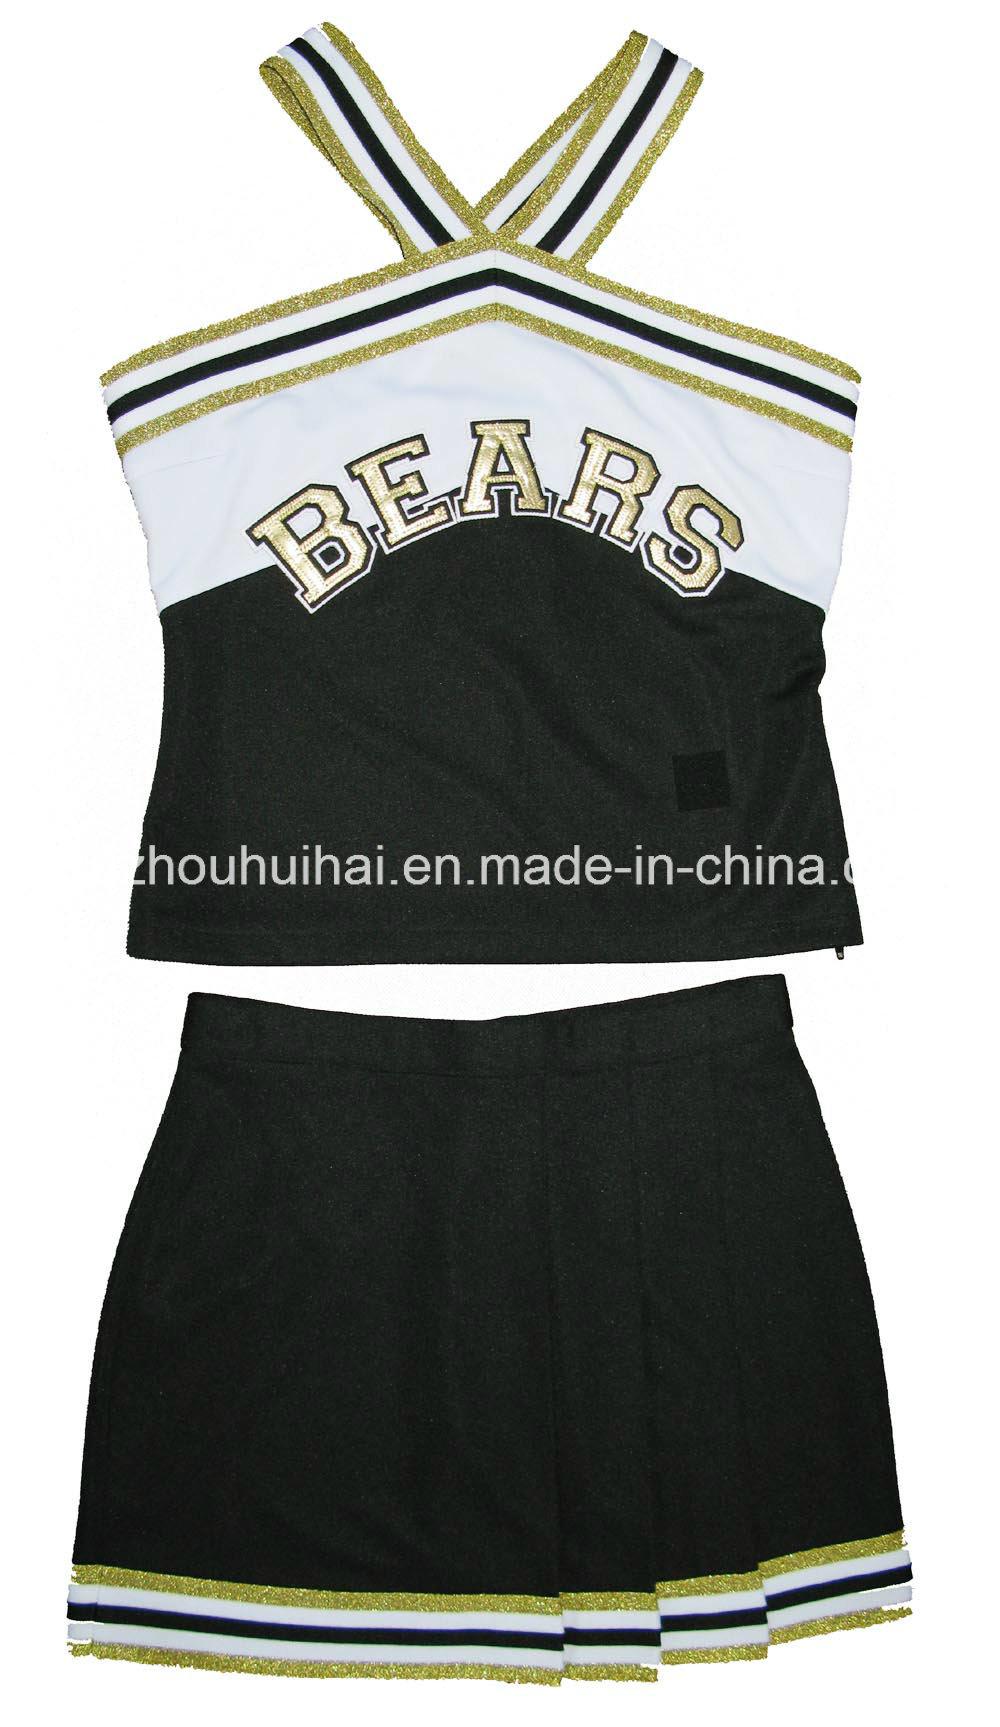 Custom Cheerleading Uniforms (U90305)